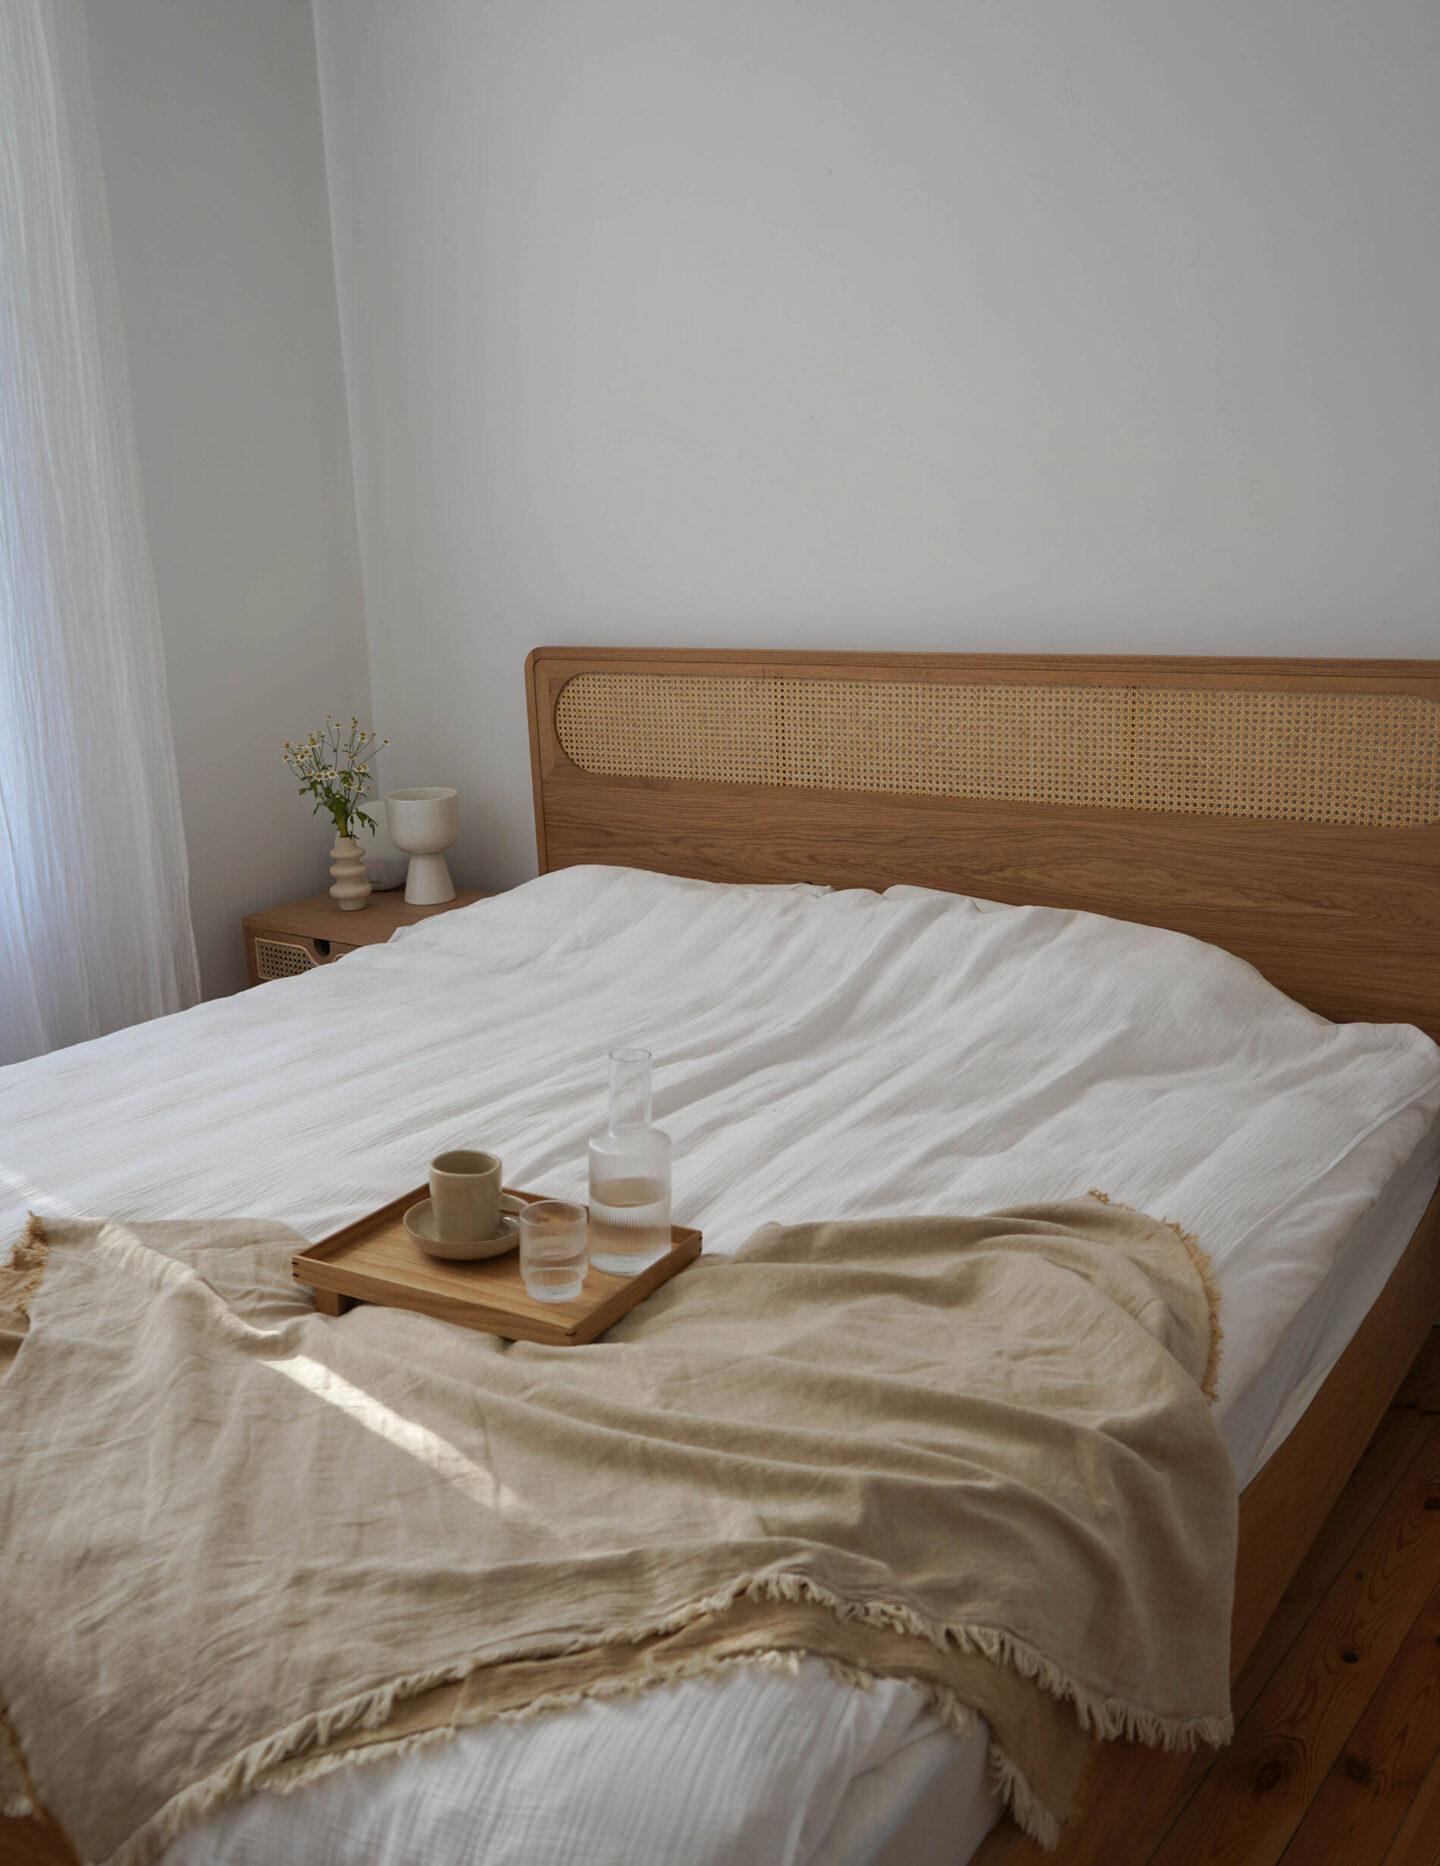 interior--scandi-bedroom-with-neutrals-wood--straw